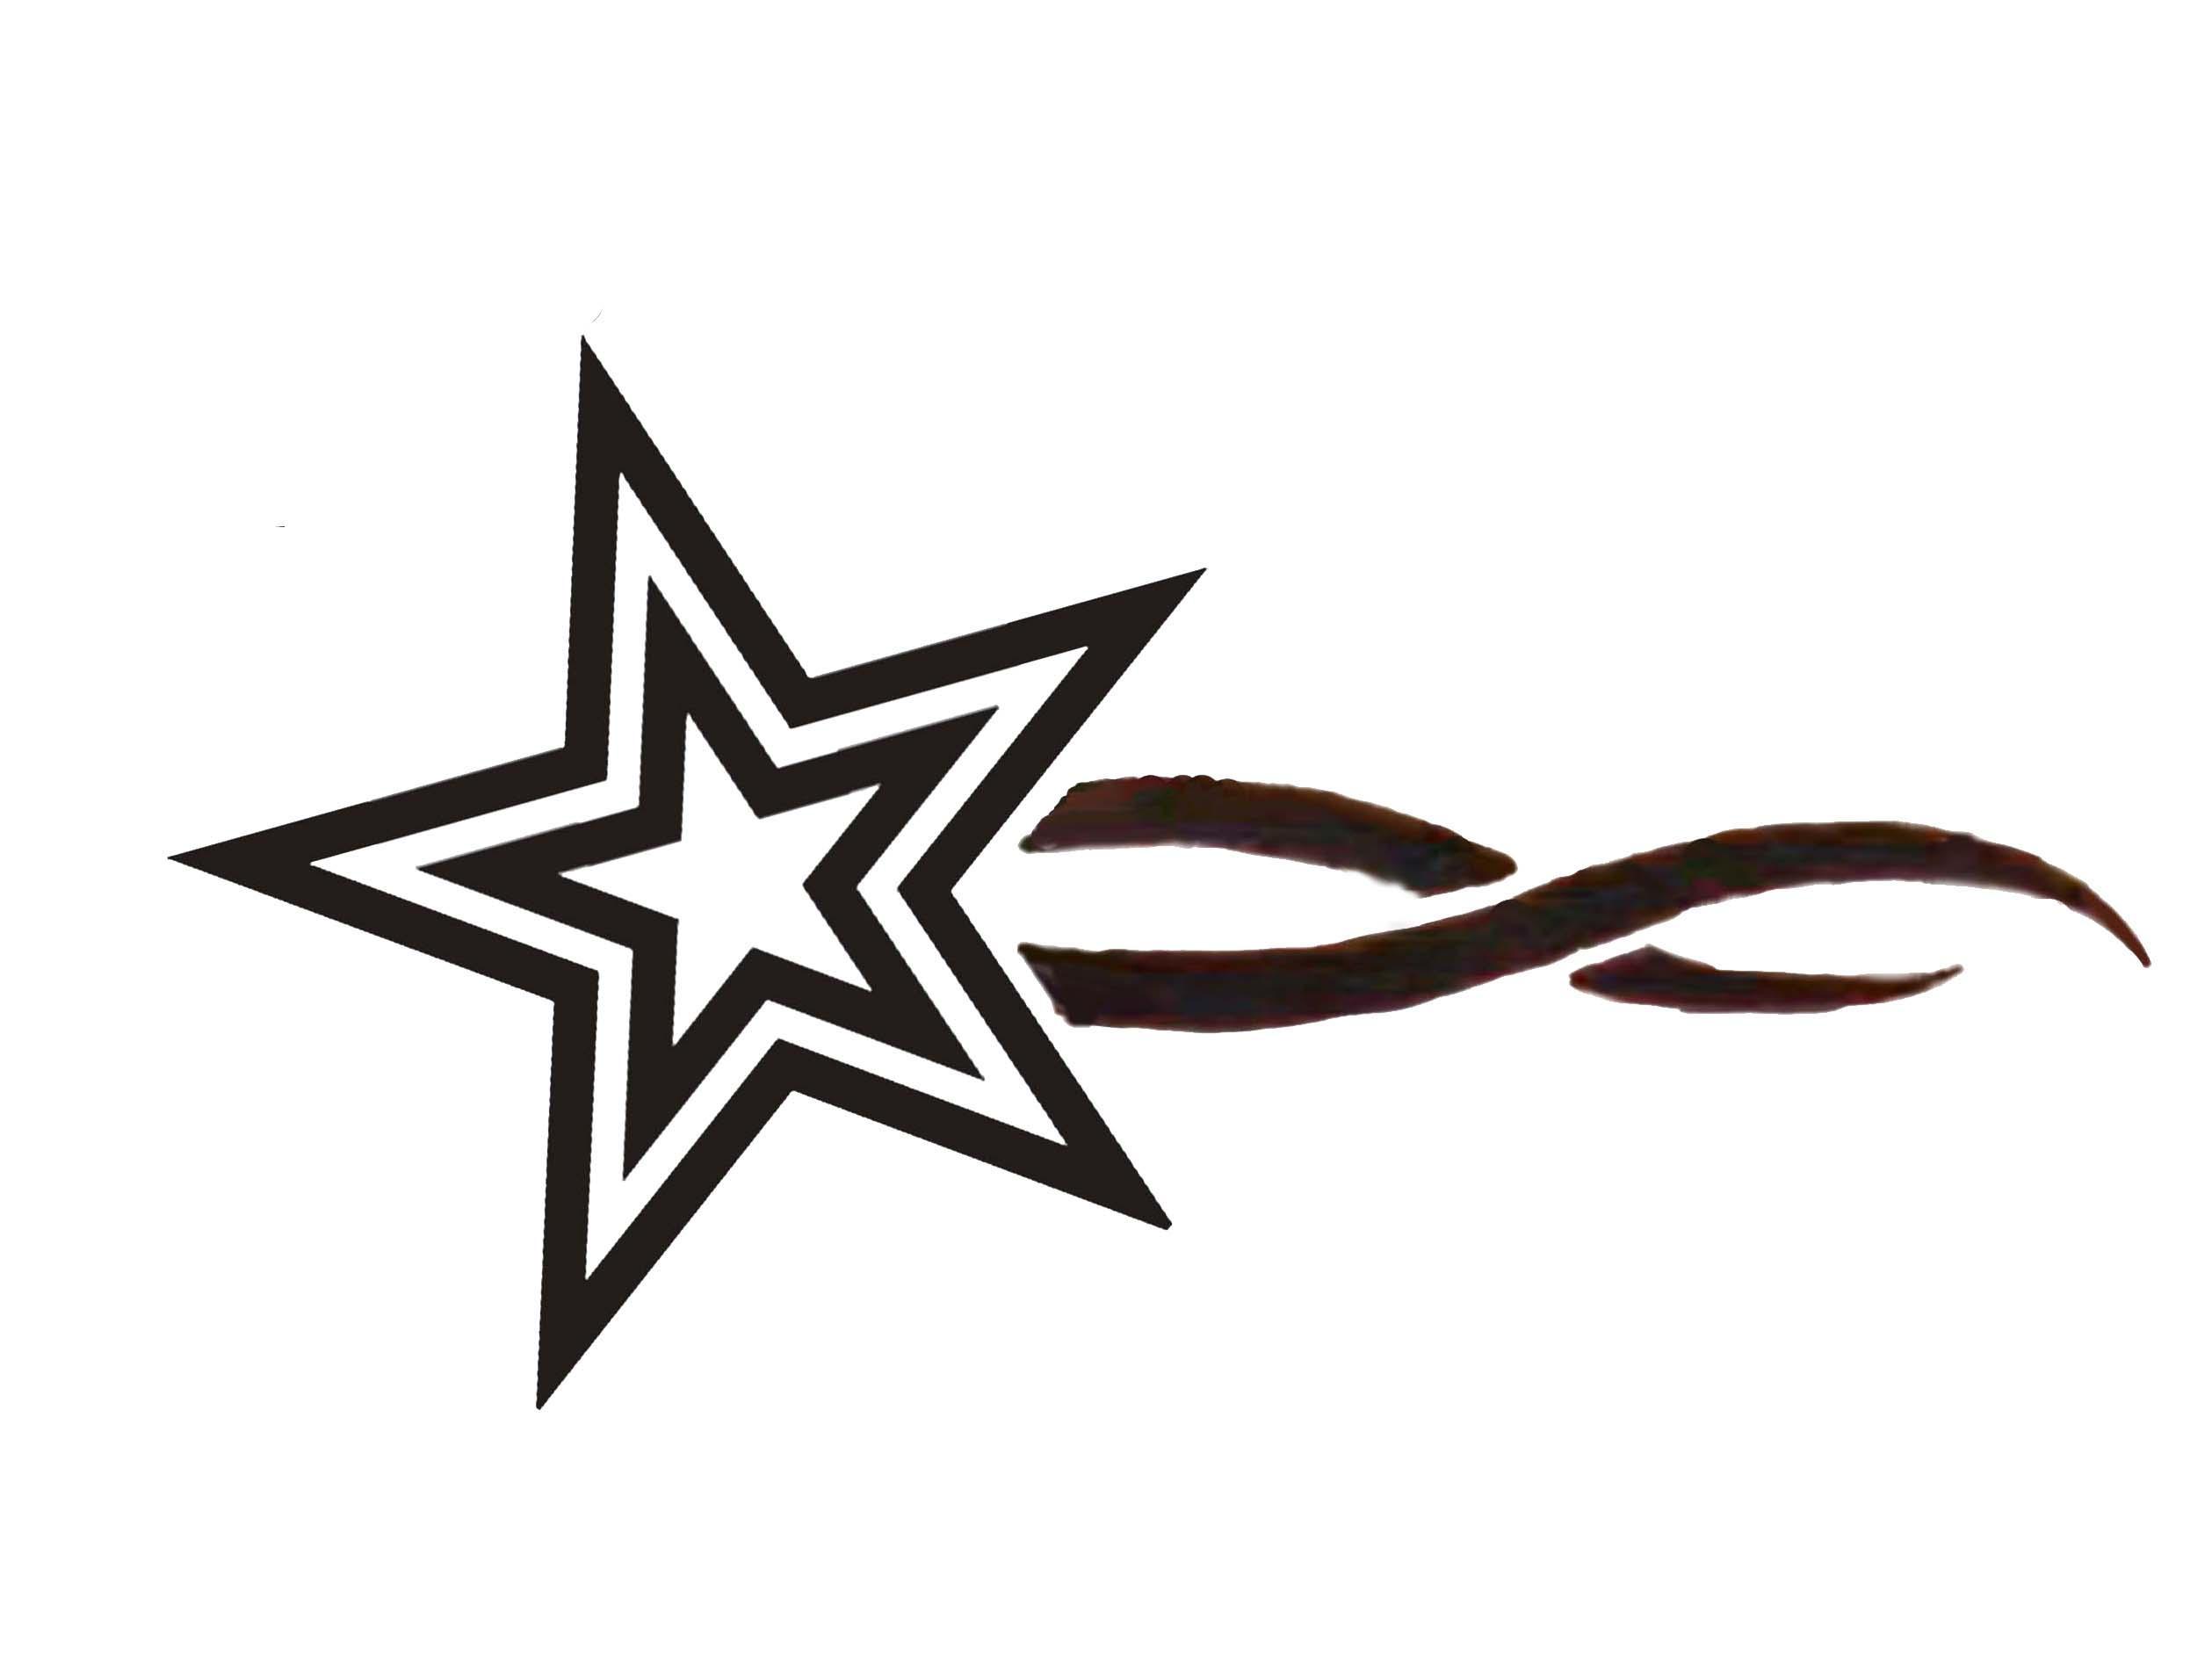 Simple Star by depth-perception Simple Star by depth-perception